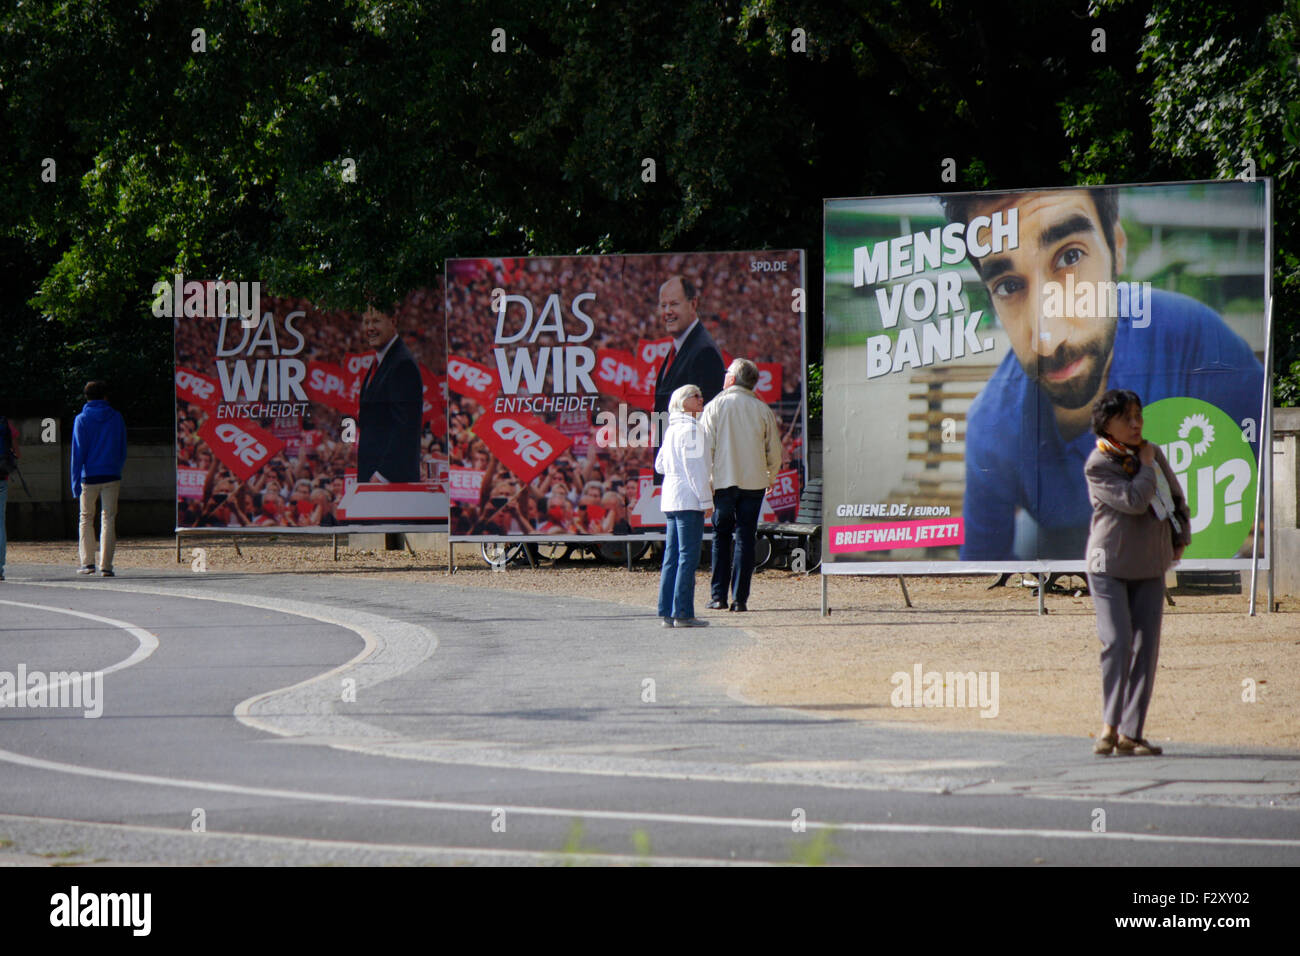 Wahlplakate zur Bundestagswahl 2013: SPD mit Peer Steinbrueck, 13. September 2013, Grosser Stern, Berlin-Tiergarten. Stock Photo